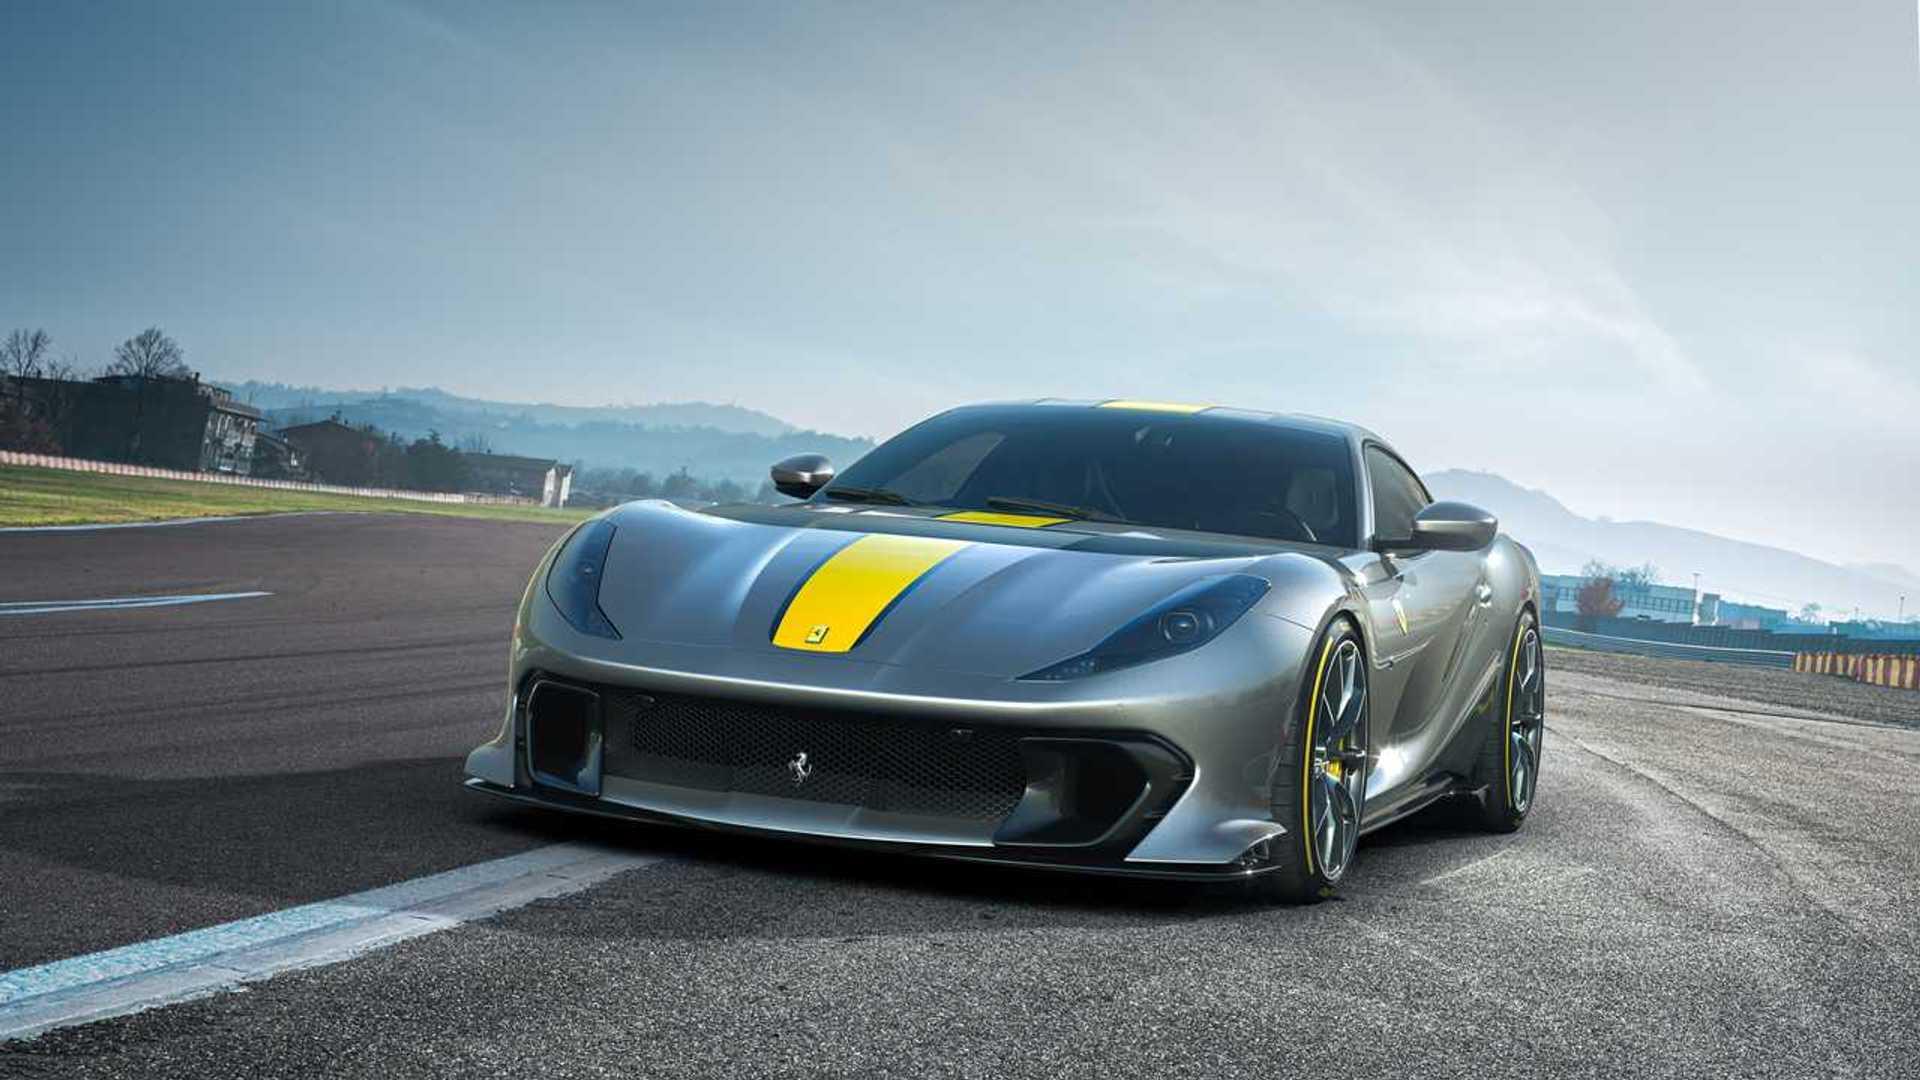 Ferrari 812 Superfastスペシャルバージョン